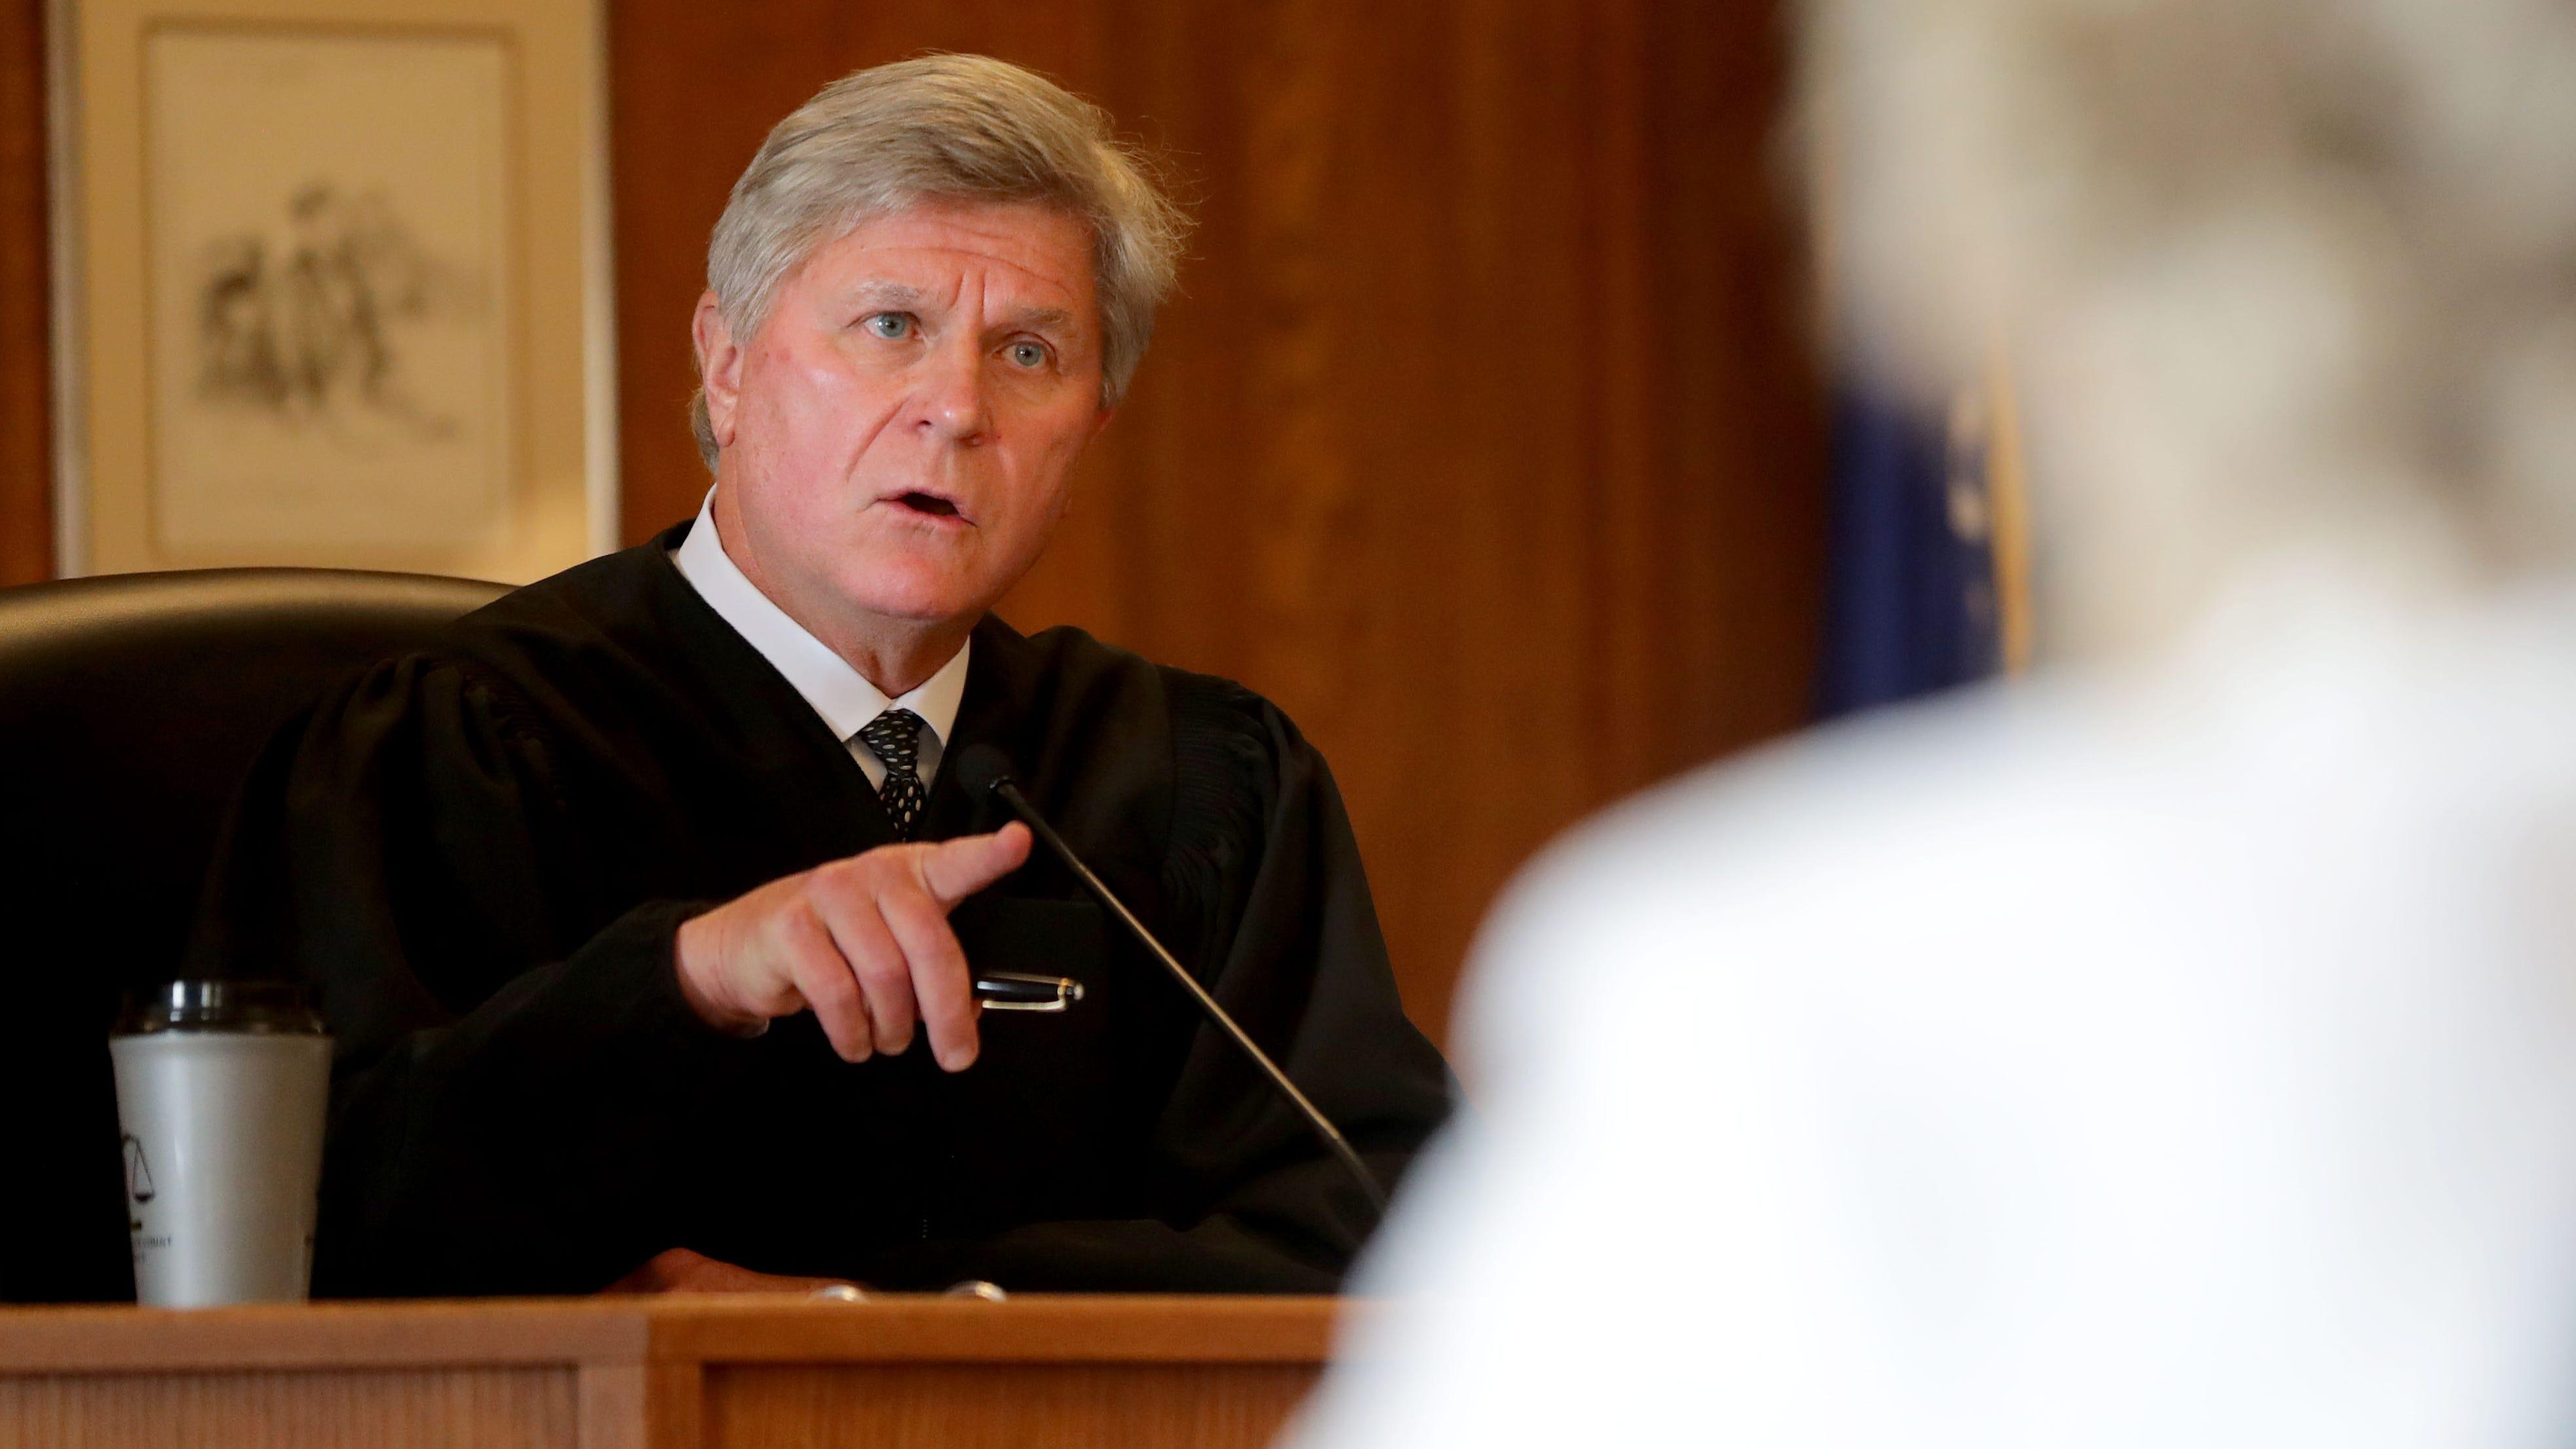 Judge delays contempt hearing in secret Racine open records case